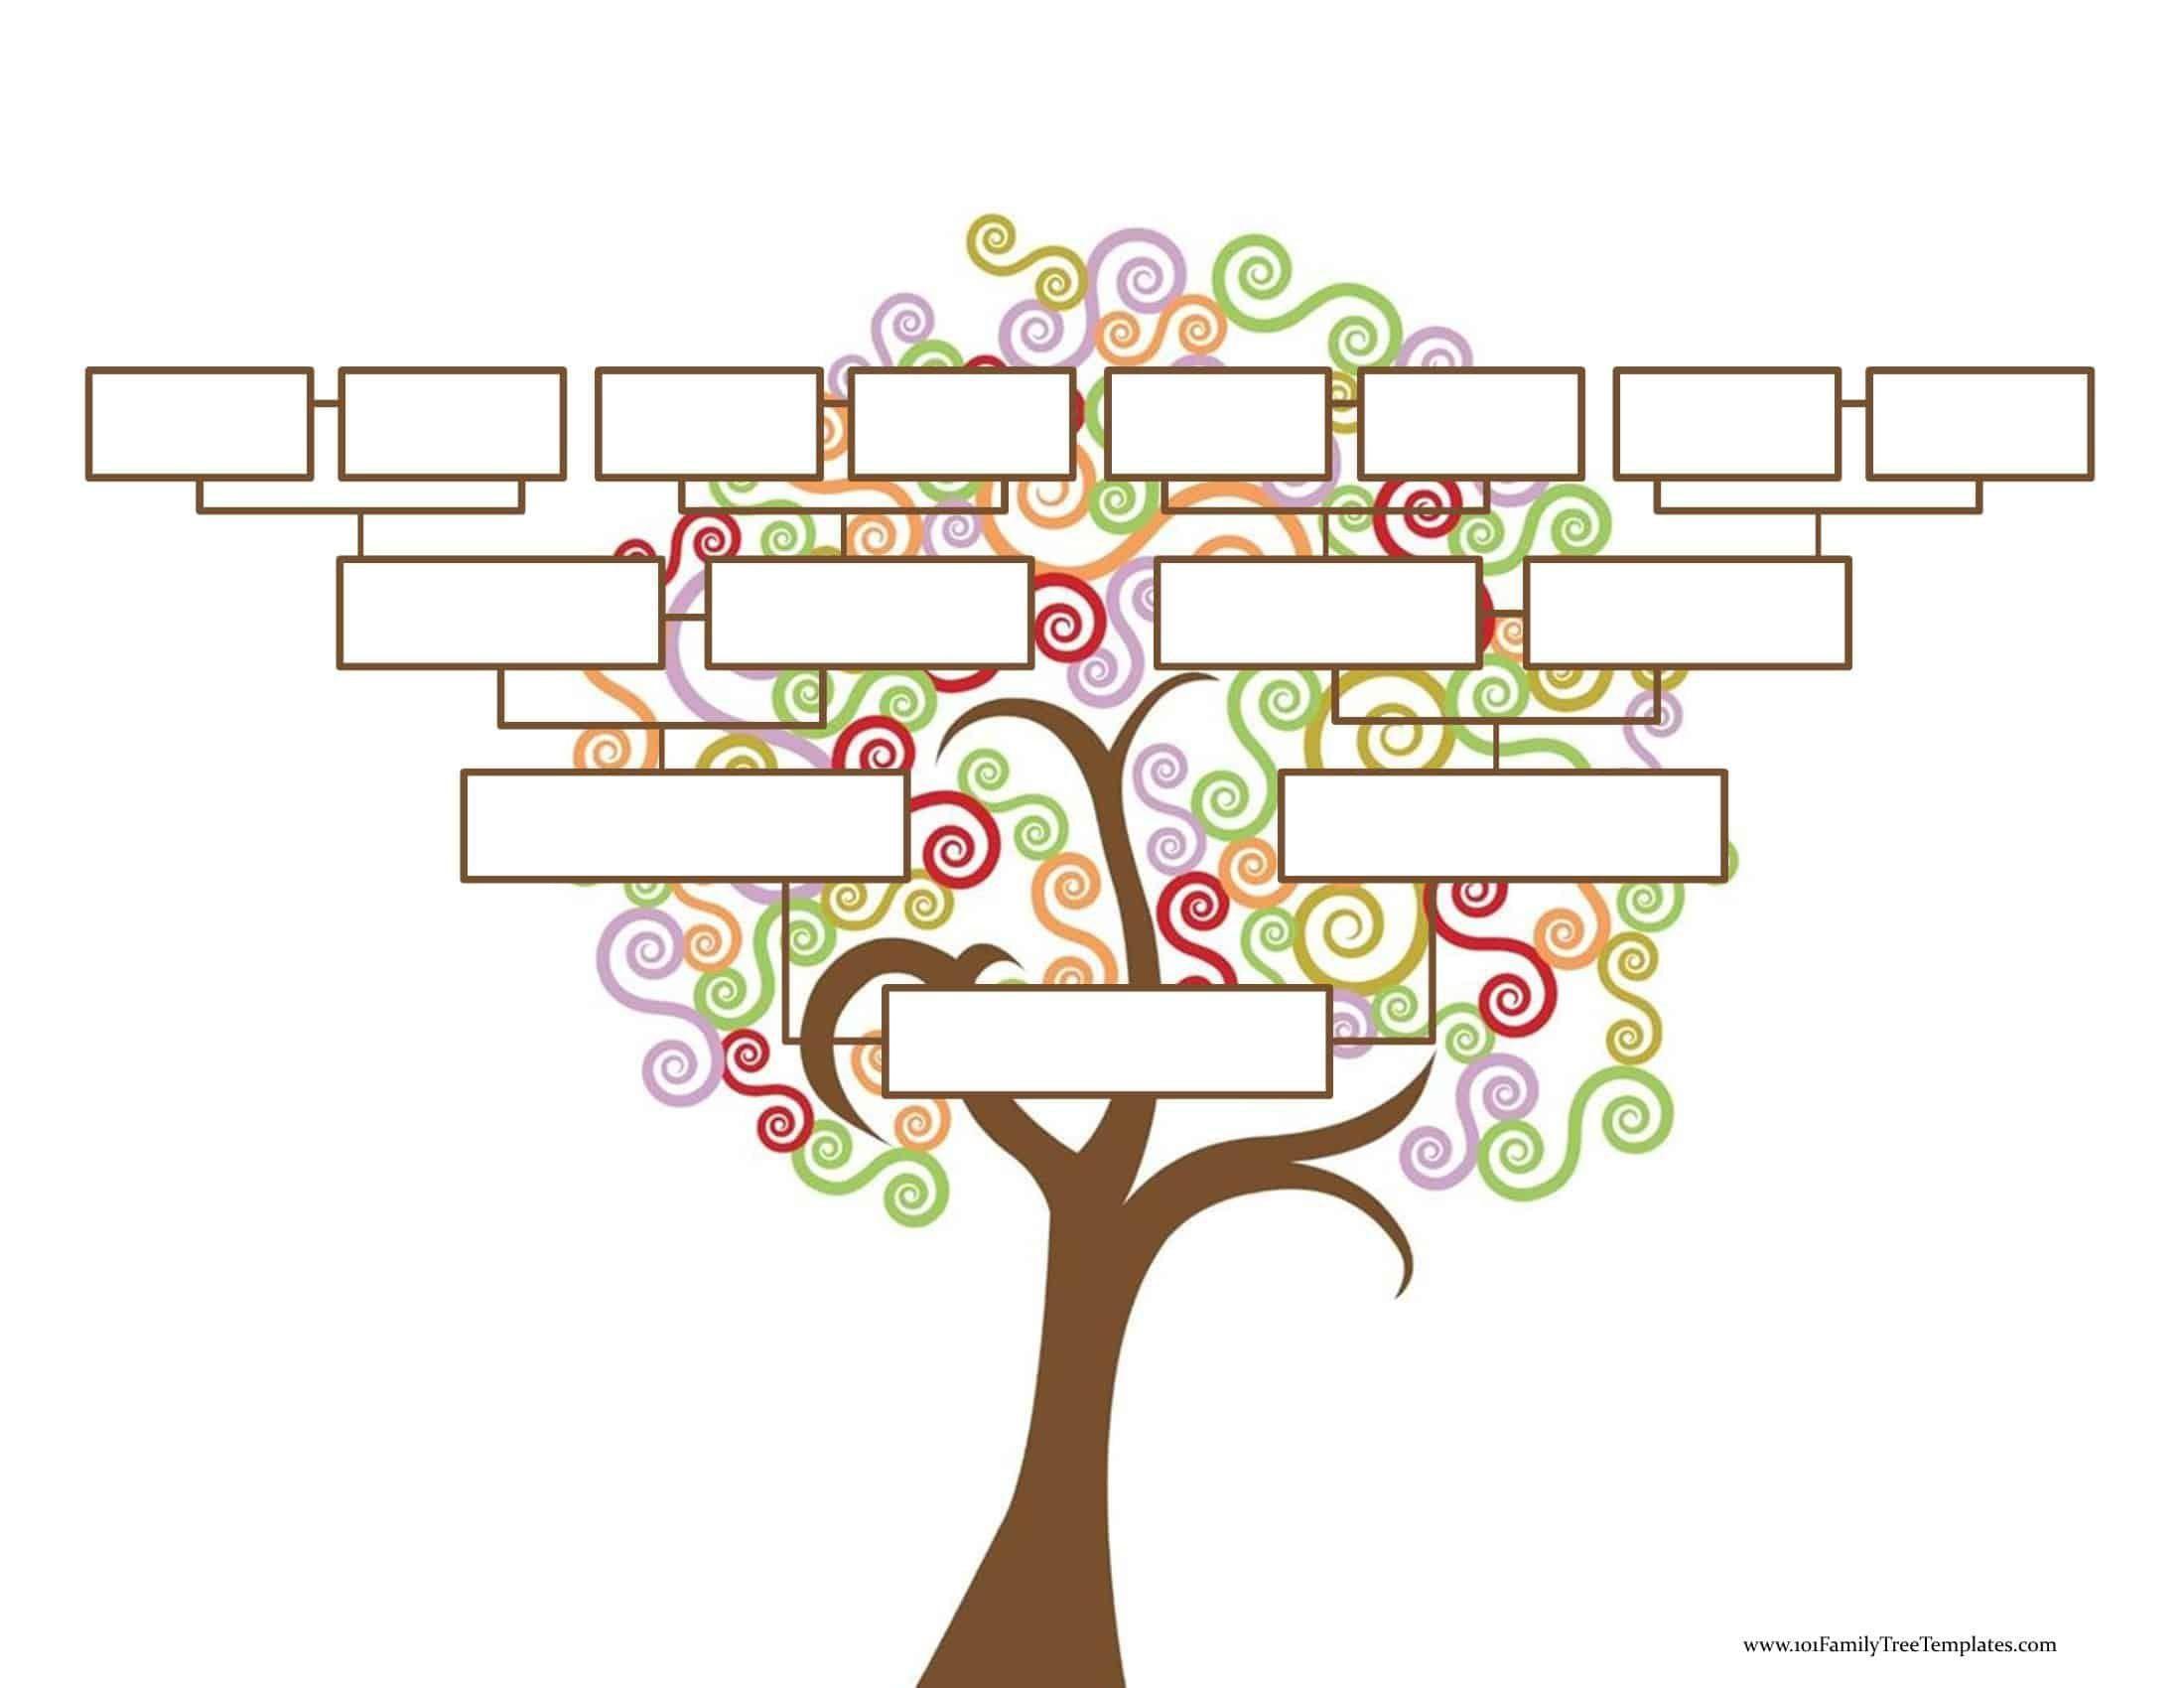 005 Sensational Free Editable Family Tree Template For Mac Example Full